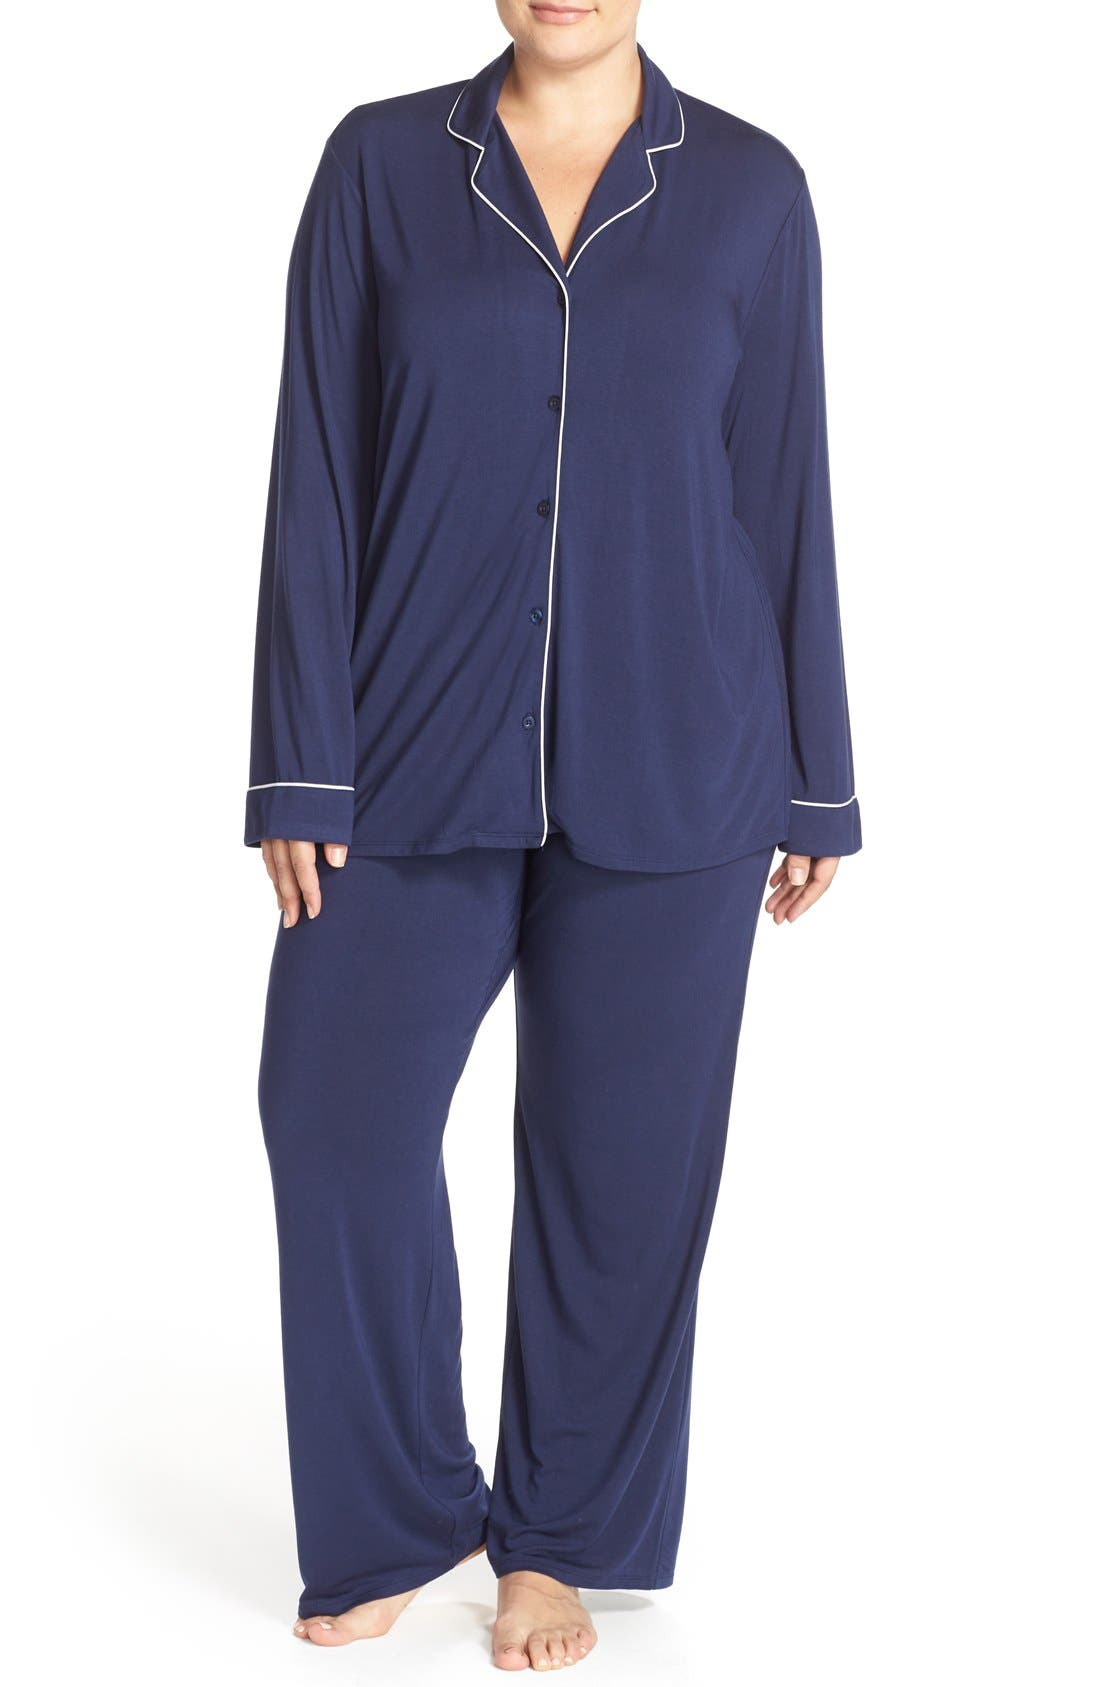 'Moonlight' Pajamas,                             Main thumbnail 1, color,                             Navy Peacoat